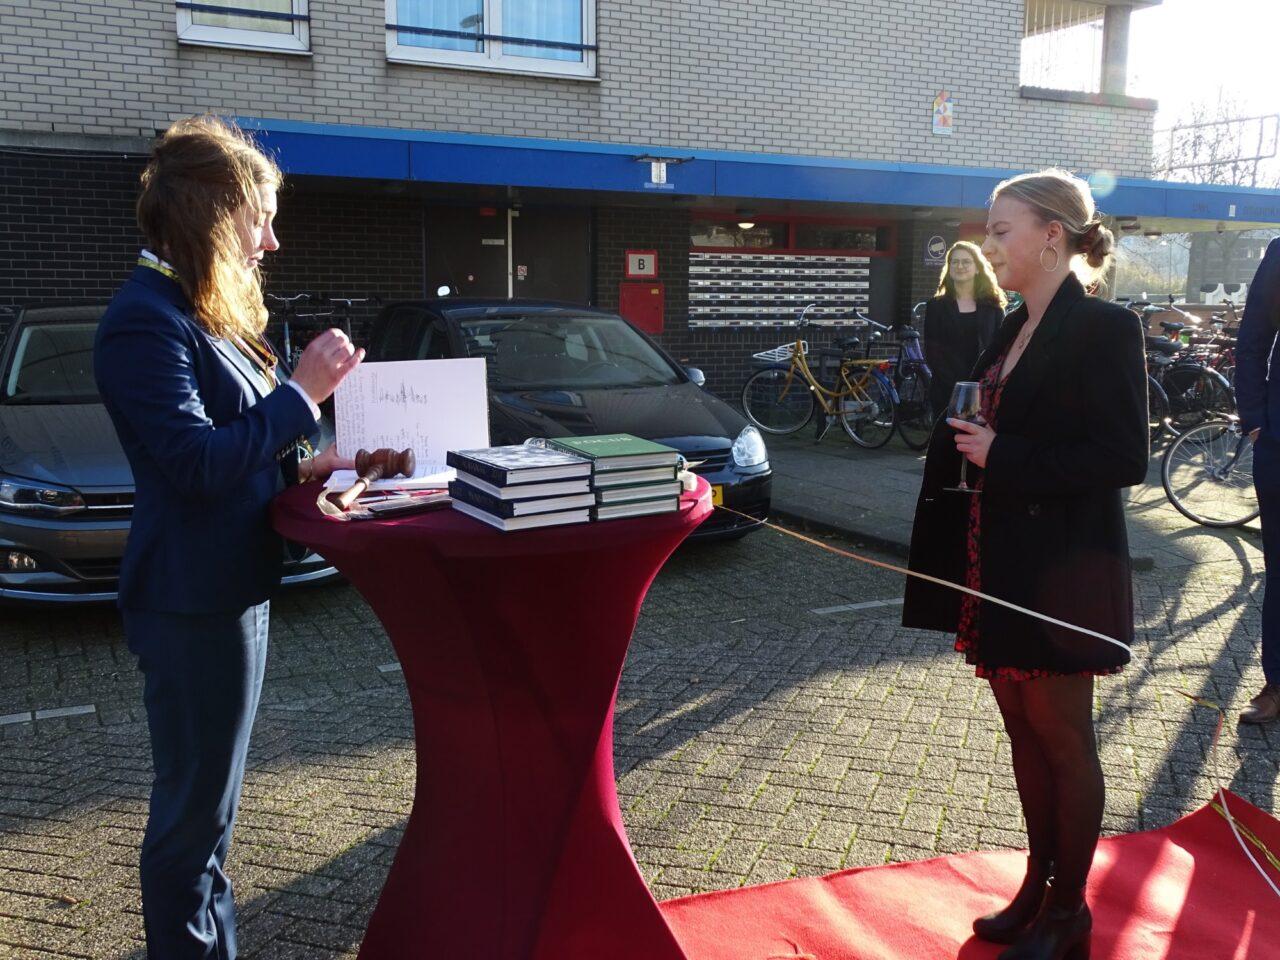 Mathilde Lones integratiedag RSG corona (EM)